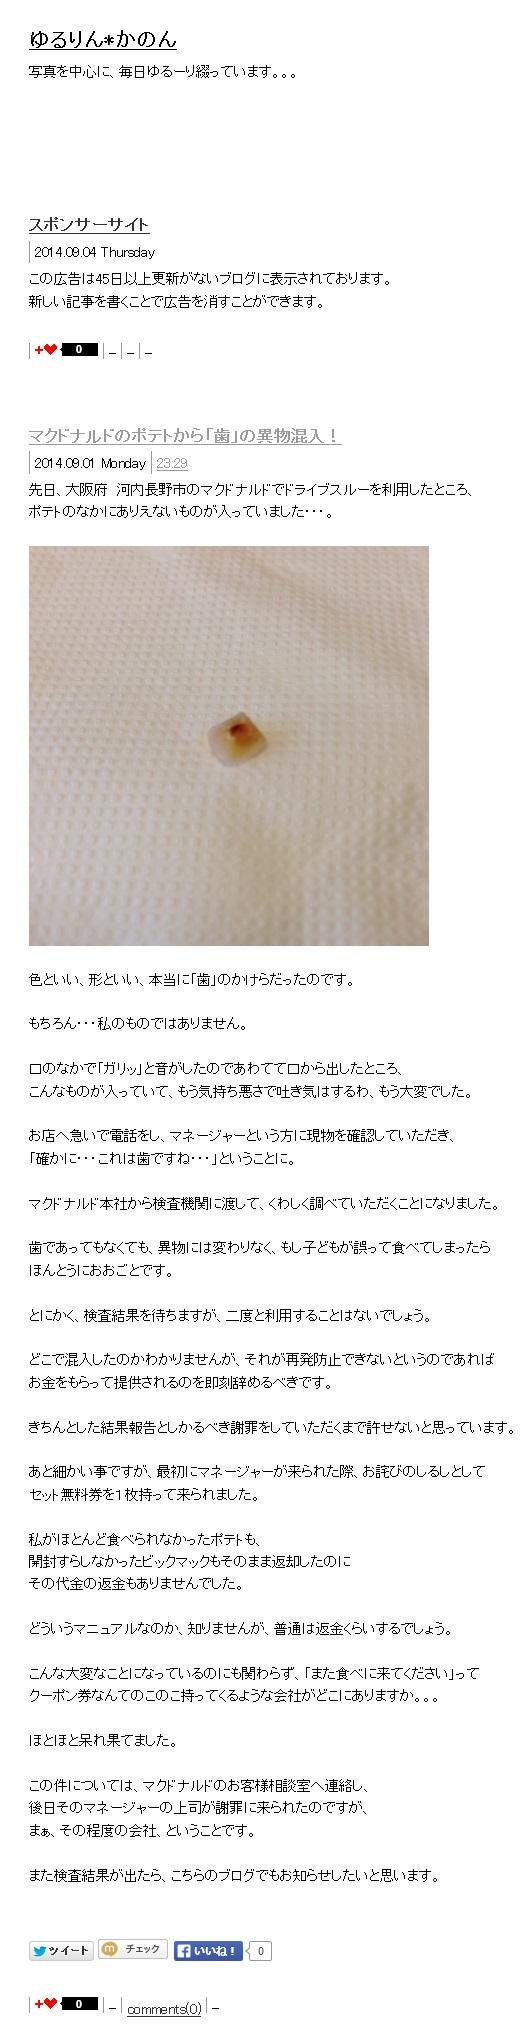 macp6.jpg